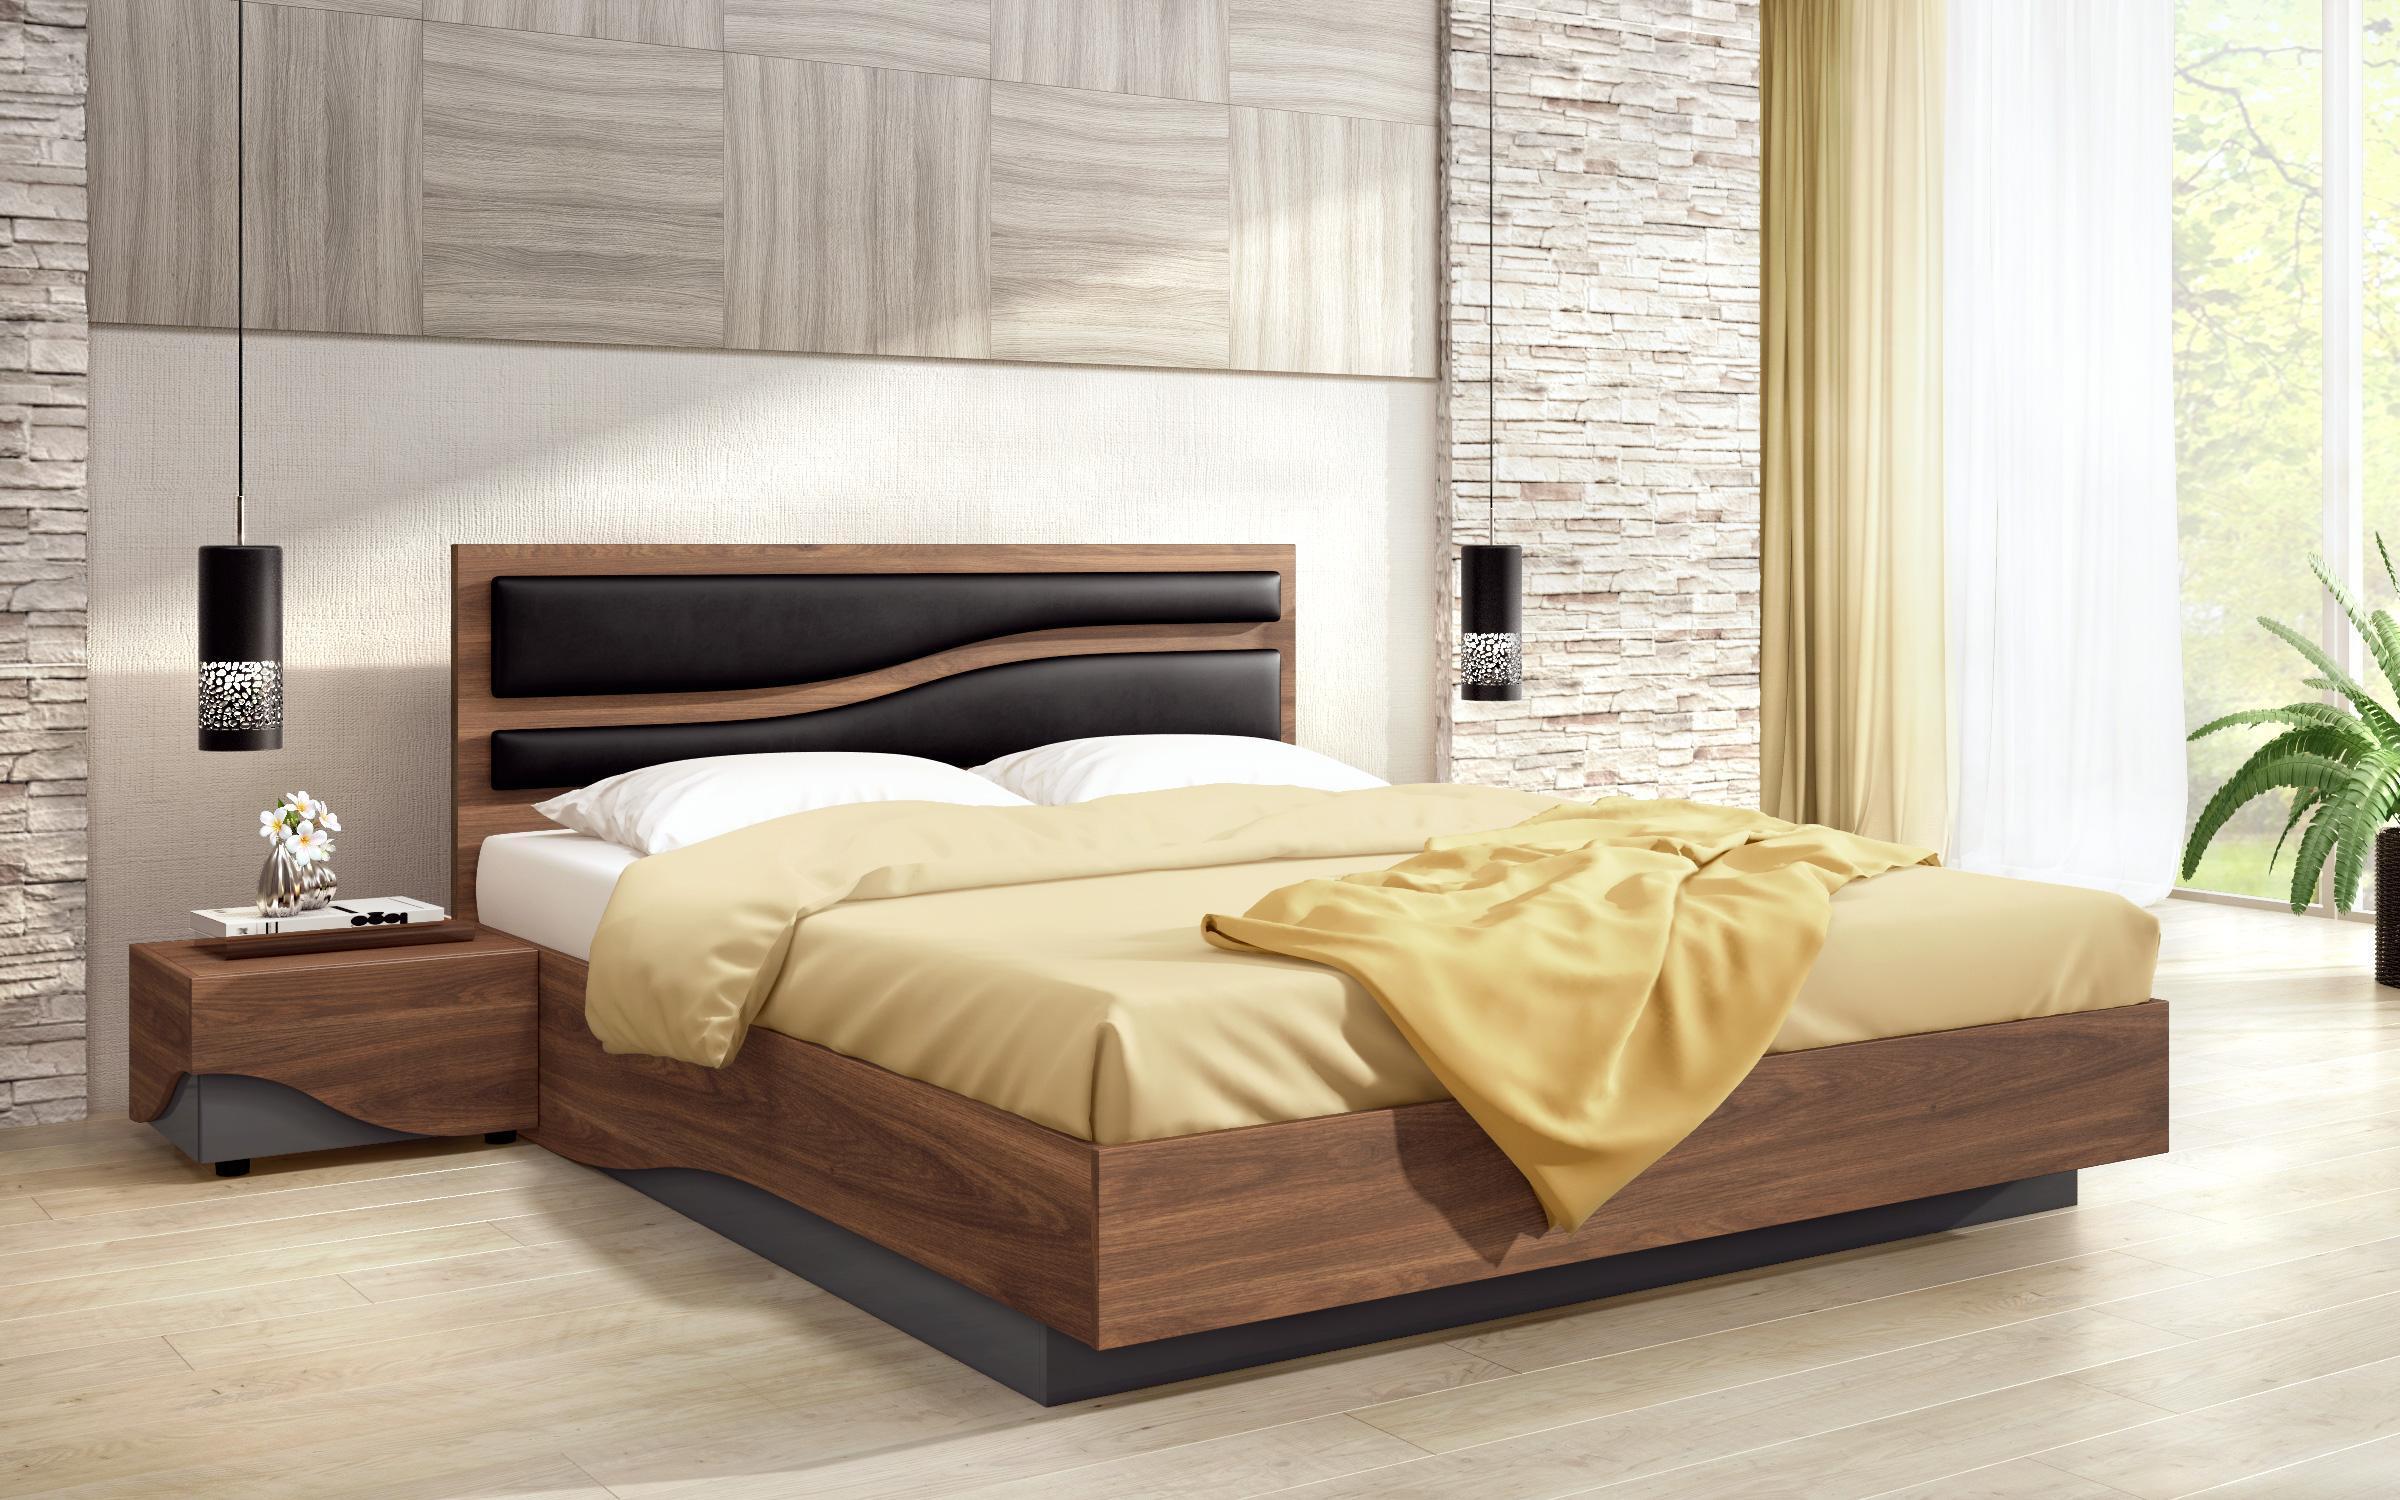 Спалня Онда + 2 броя нощни шкафчета , дъб коняк + антрацит гланц